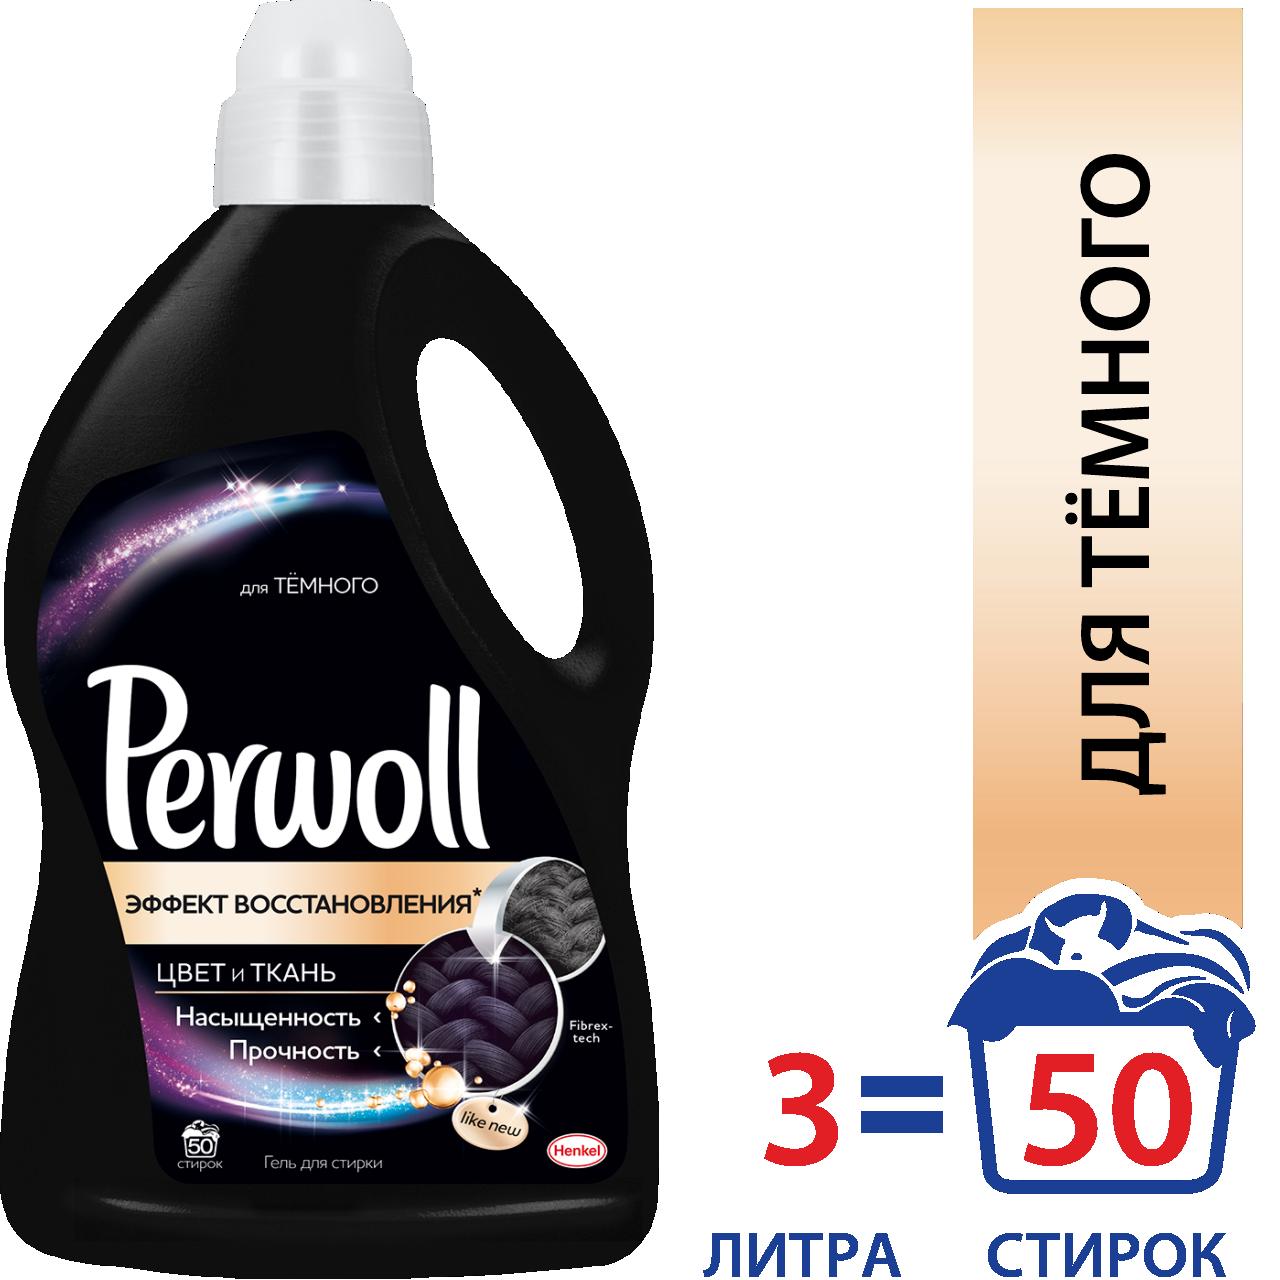 Средство для стирки PERWOLL Сияние Черного, 3 л.